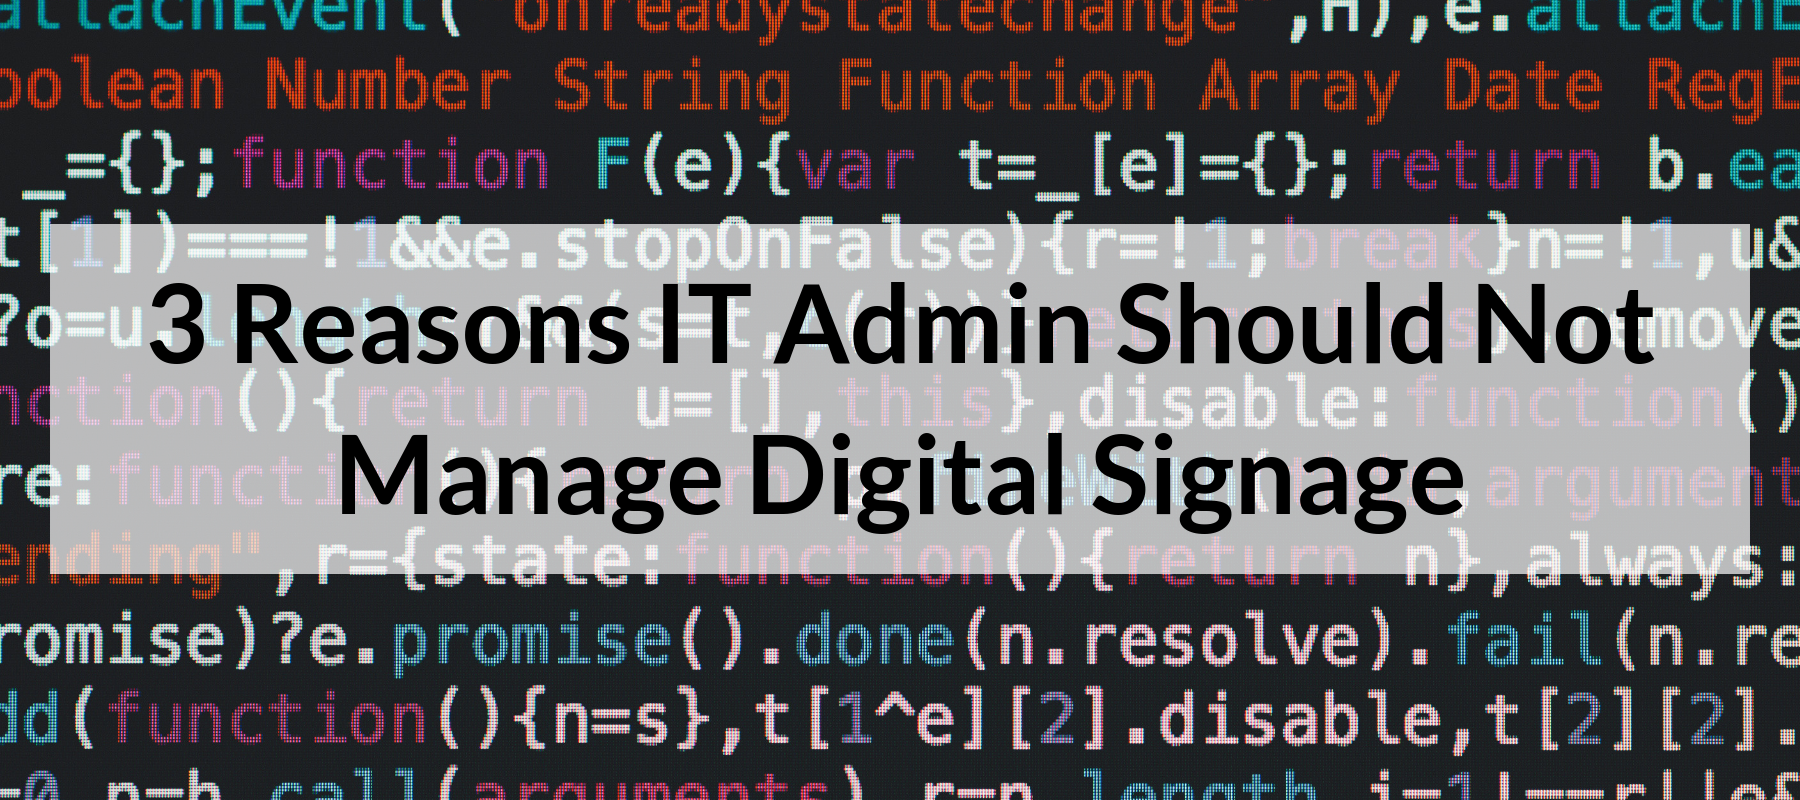 3 Reasons IT Admin Should Not Manage Digital Signage